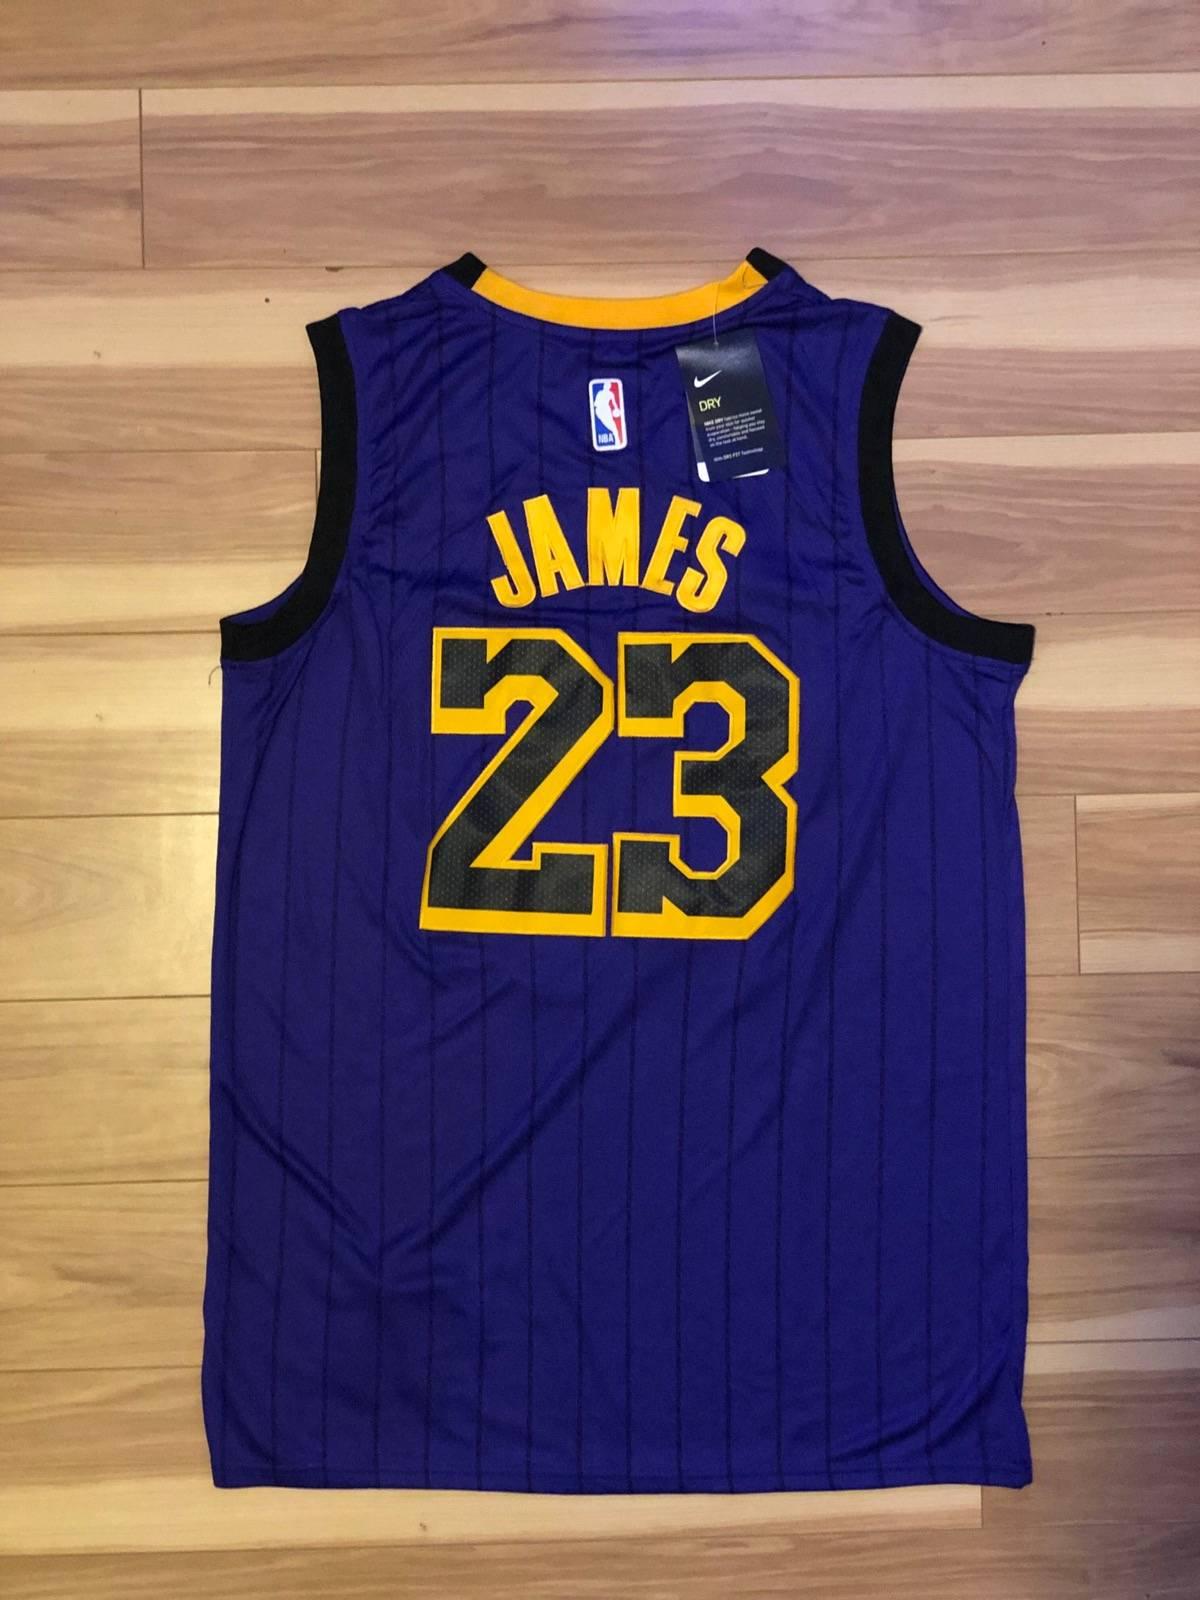 online retailer 7fb43 920b9 Nike Nike Lebron James Laker Jersey Size L $49